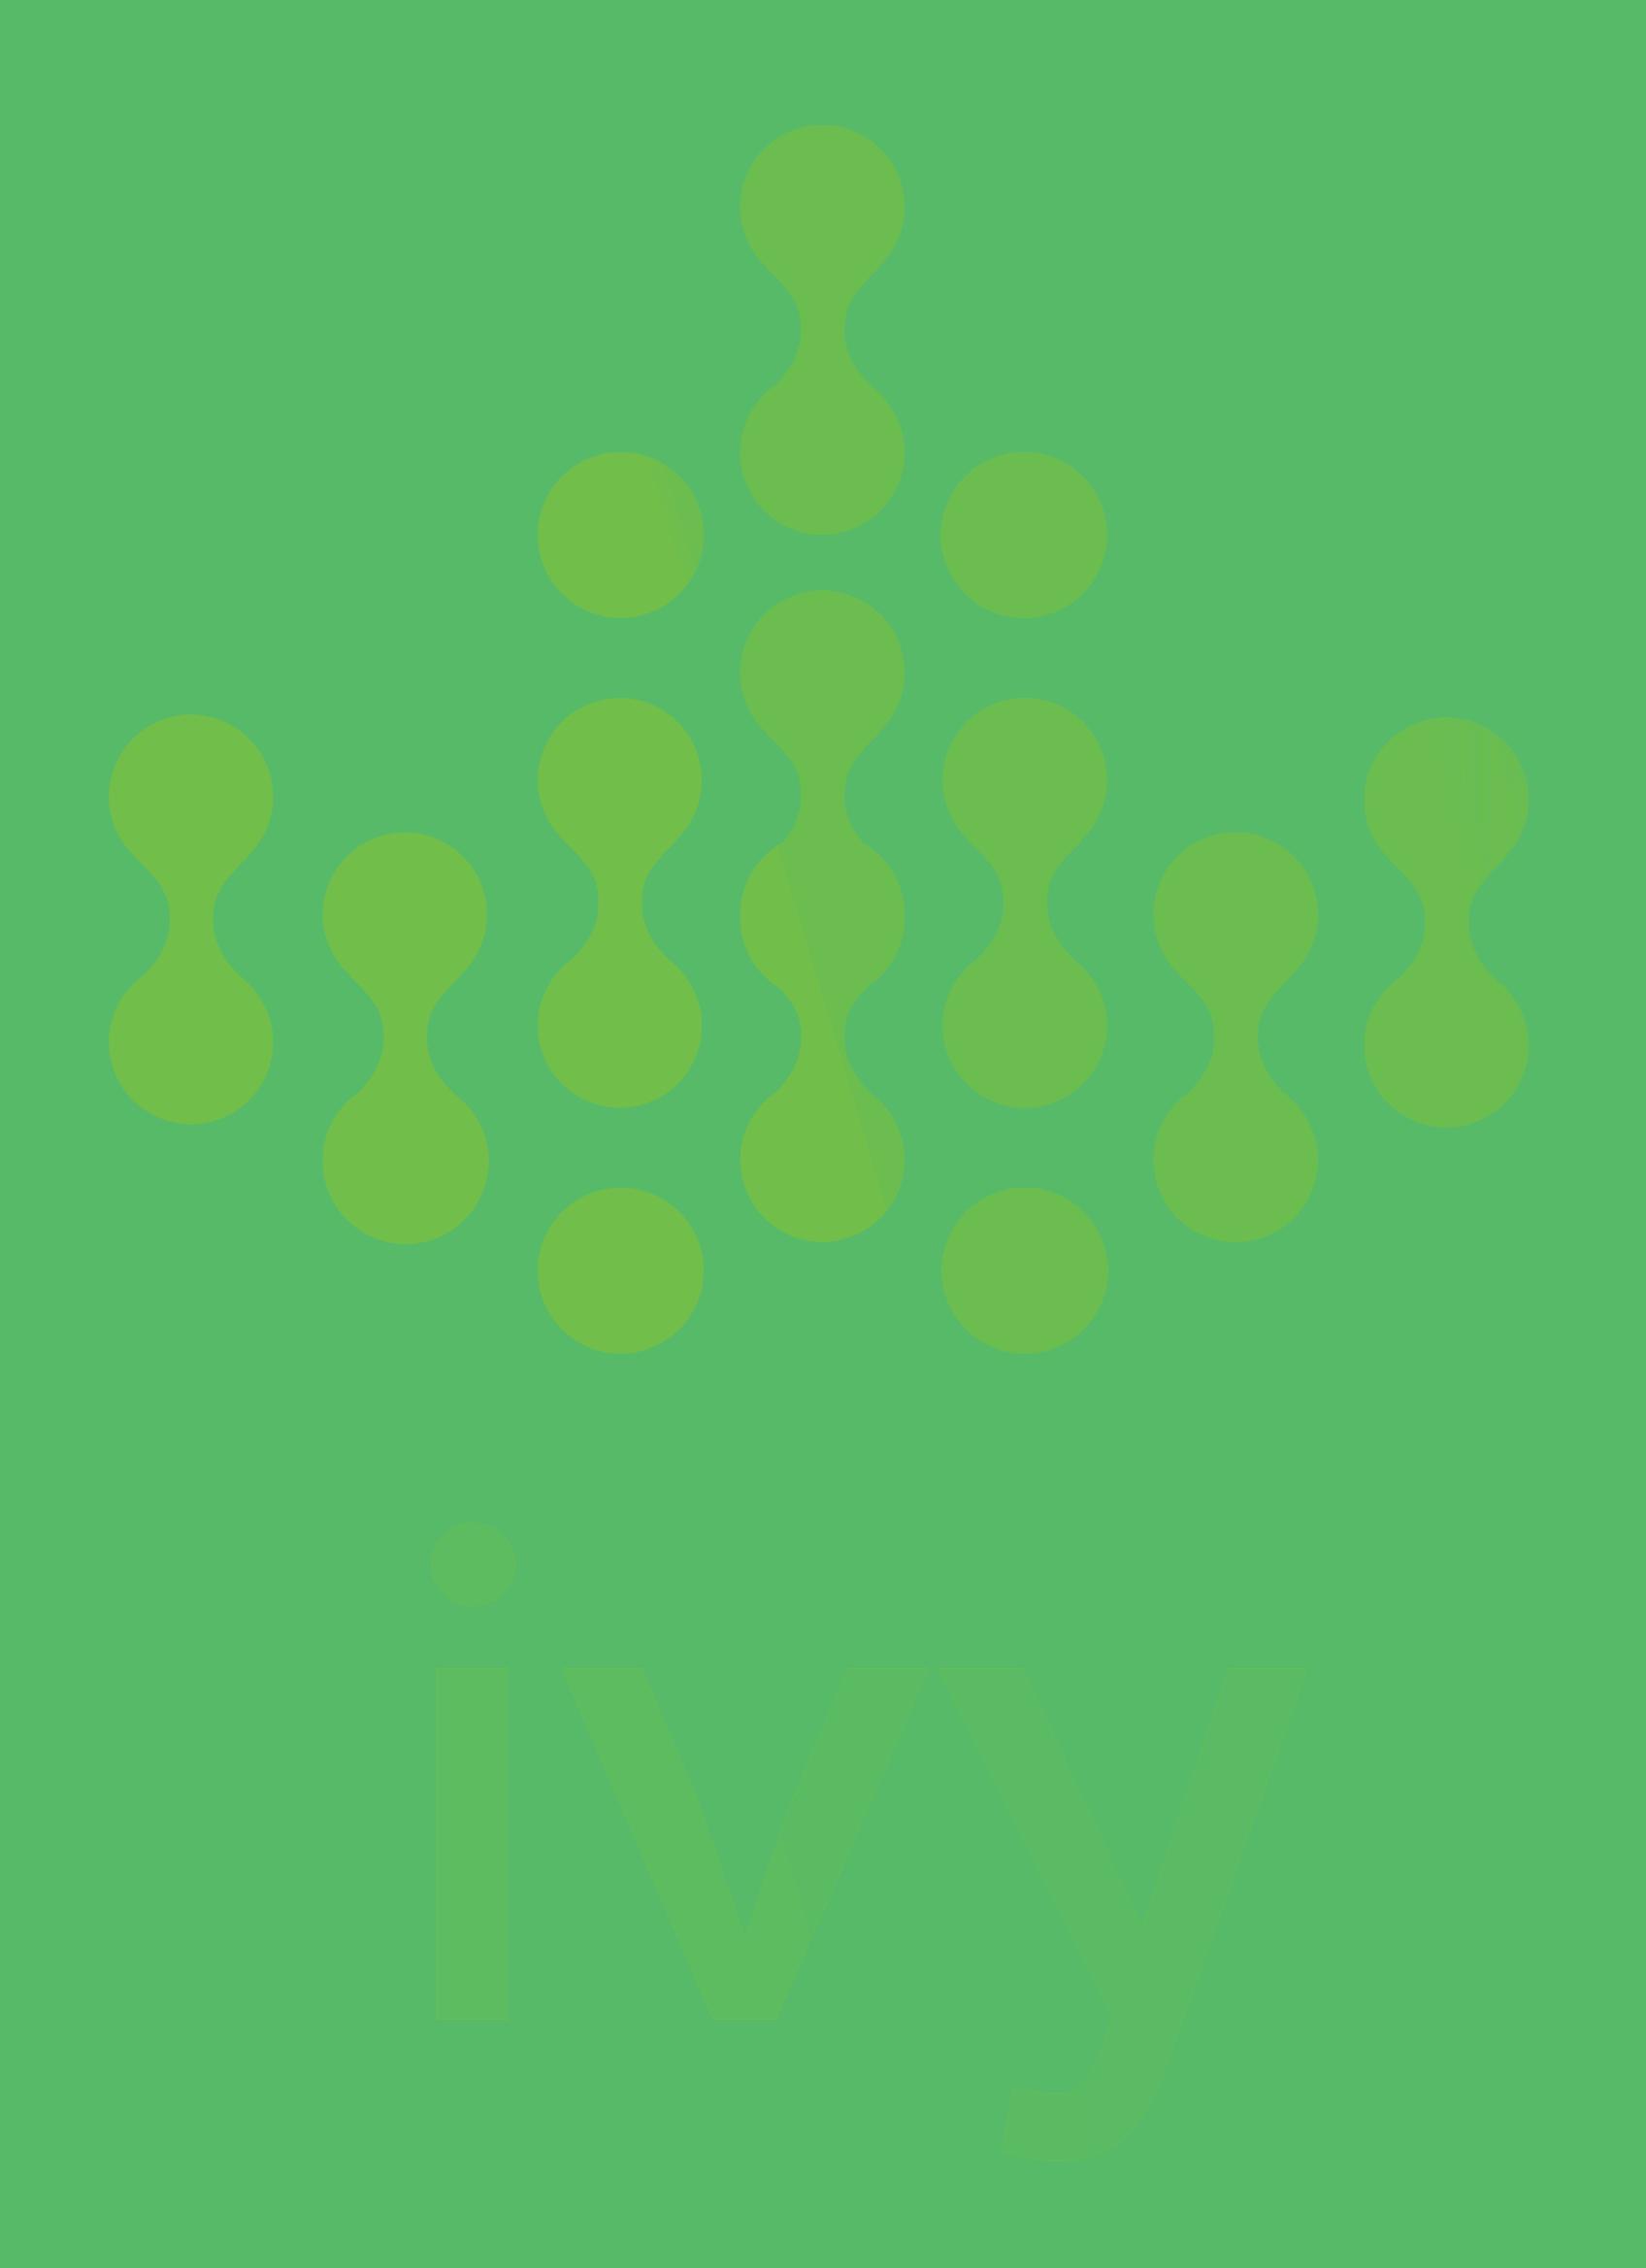 Ivy Ico Logo